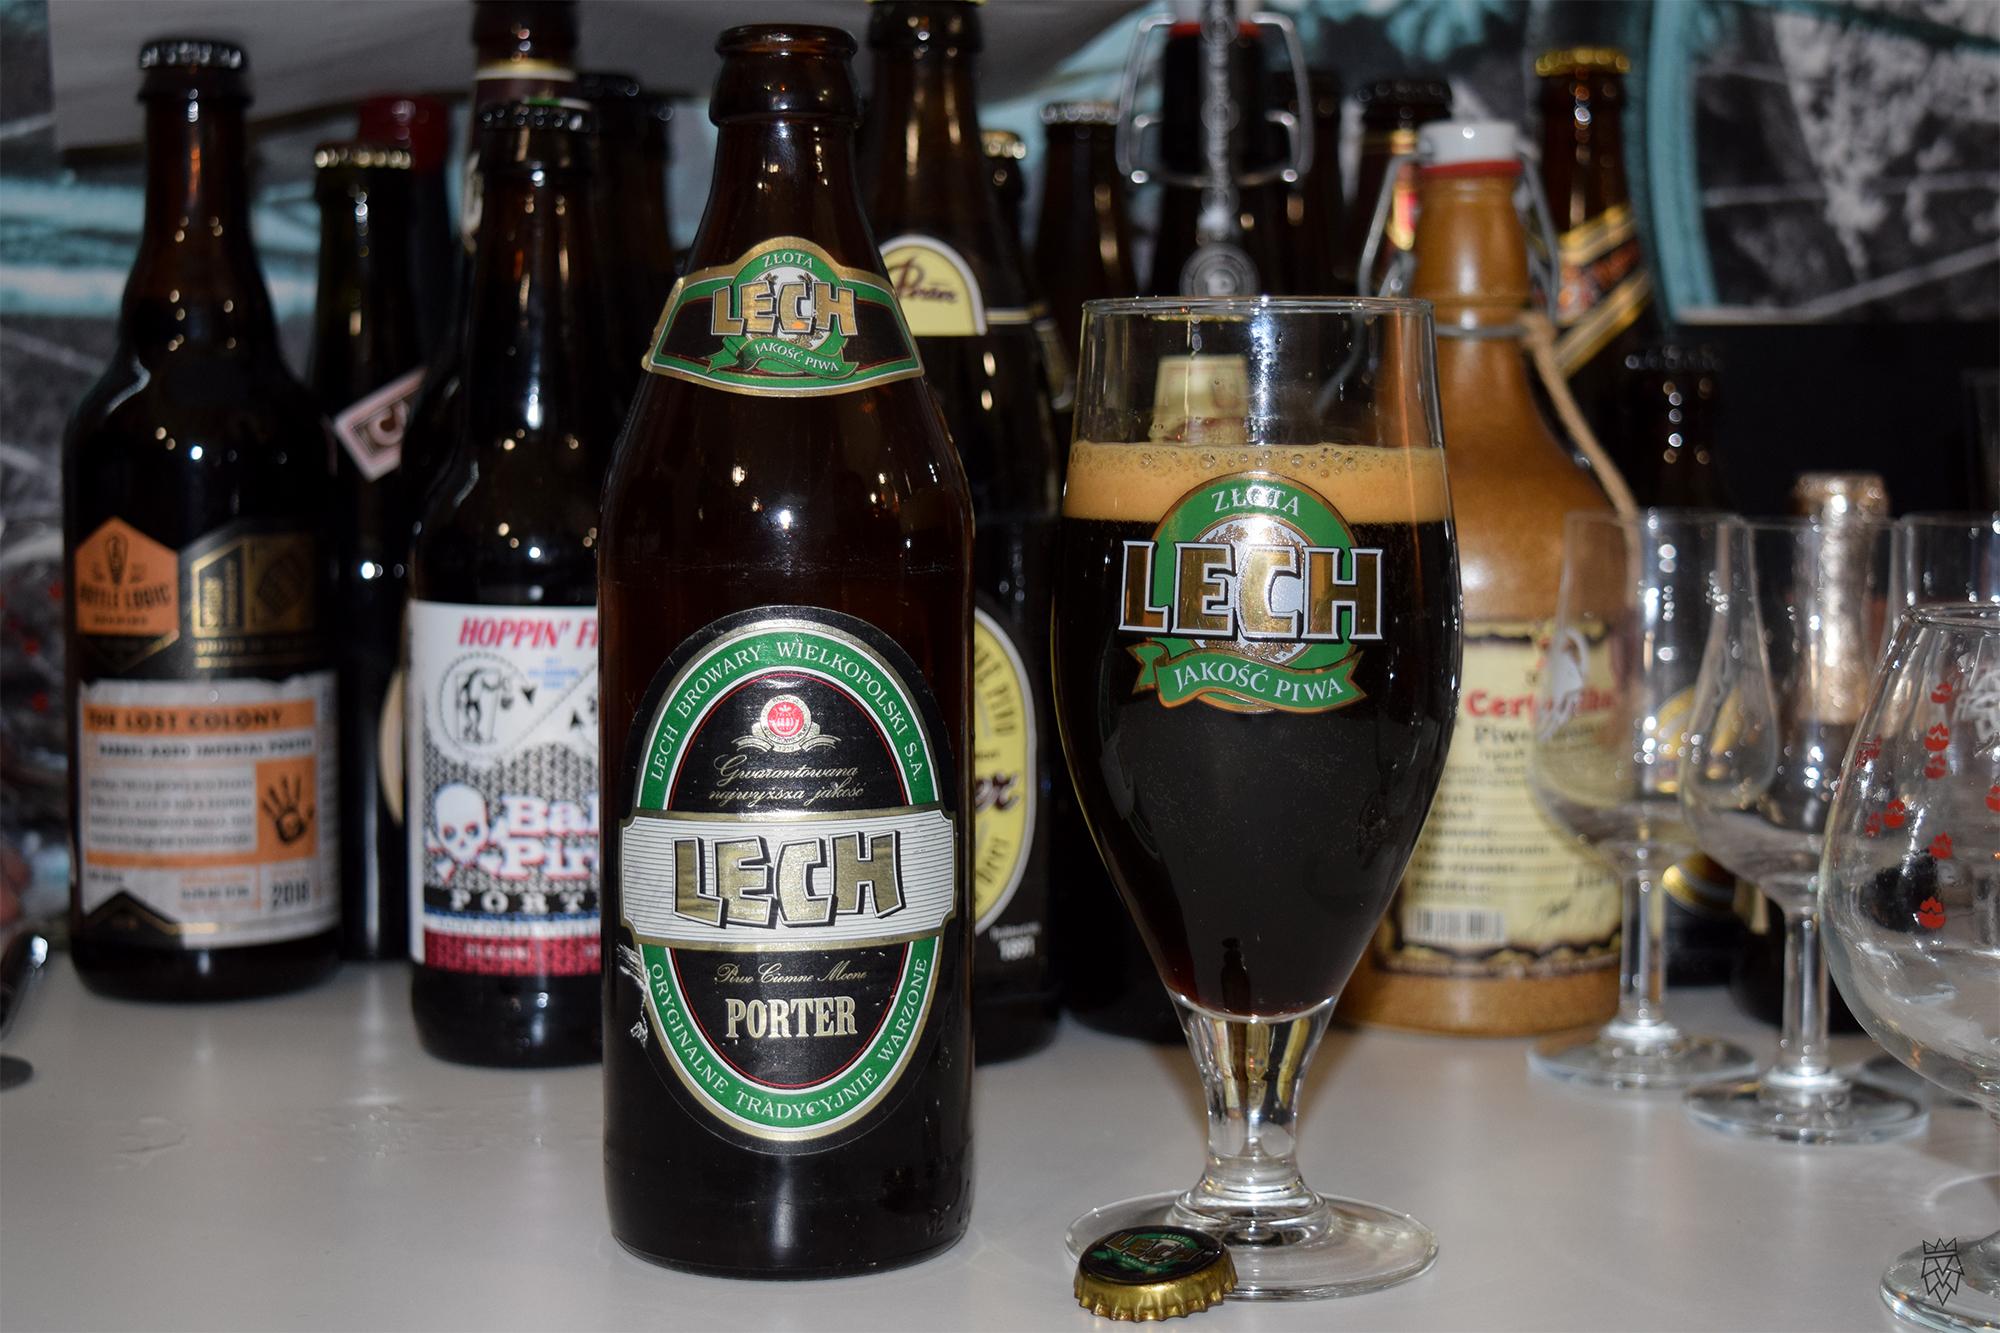 Lech Porter 1999